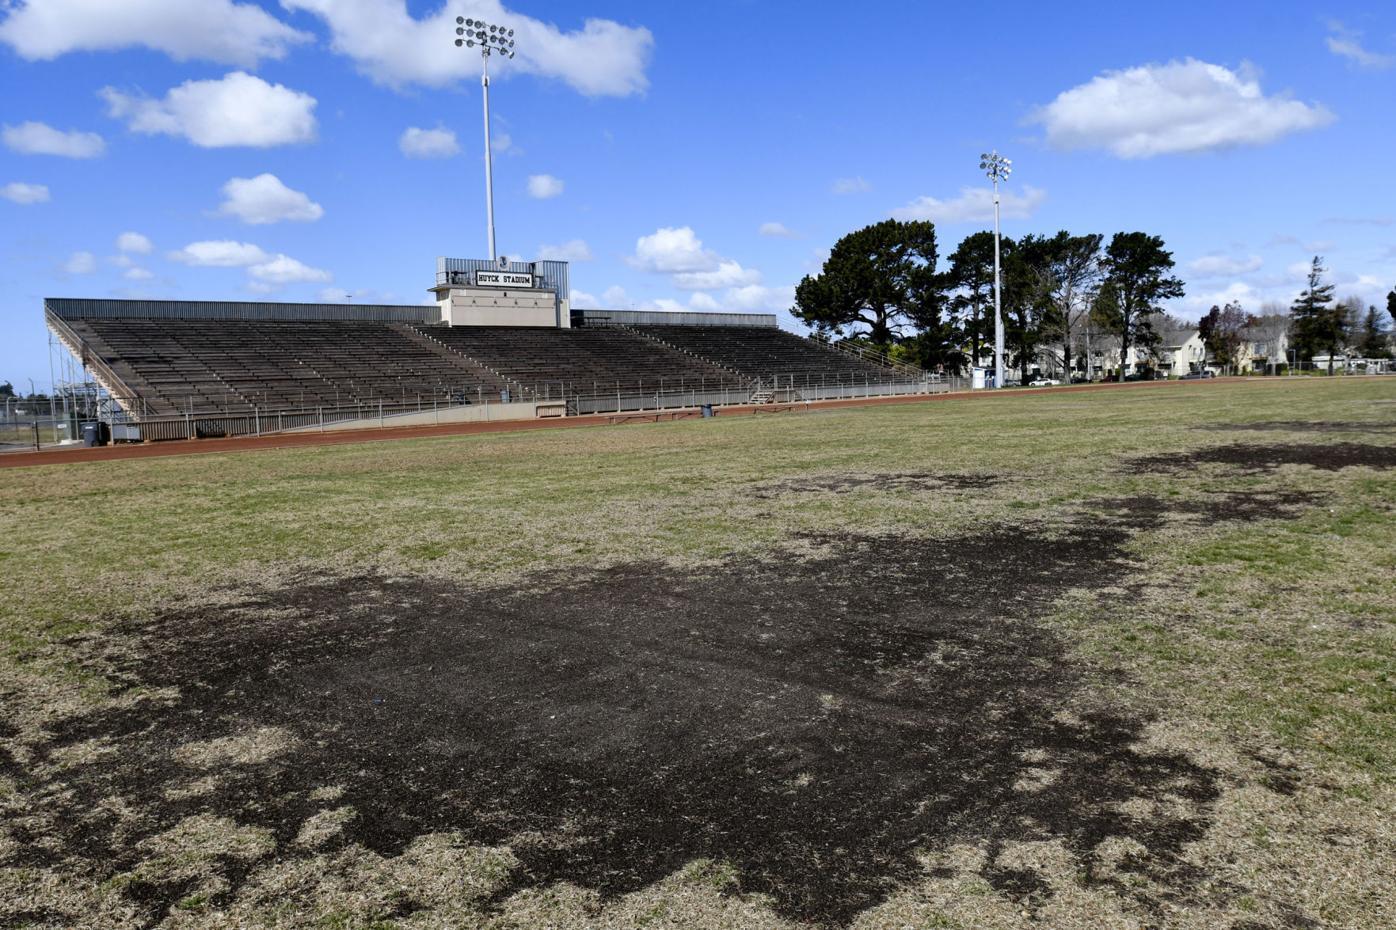 Current field at Huyck Stadium (copy)